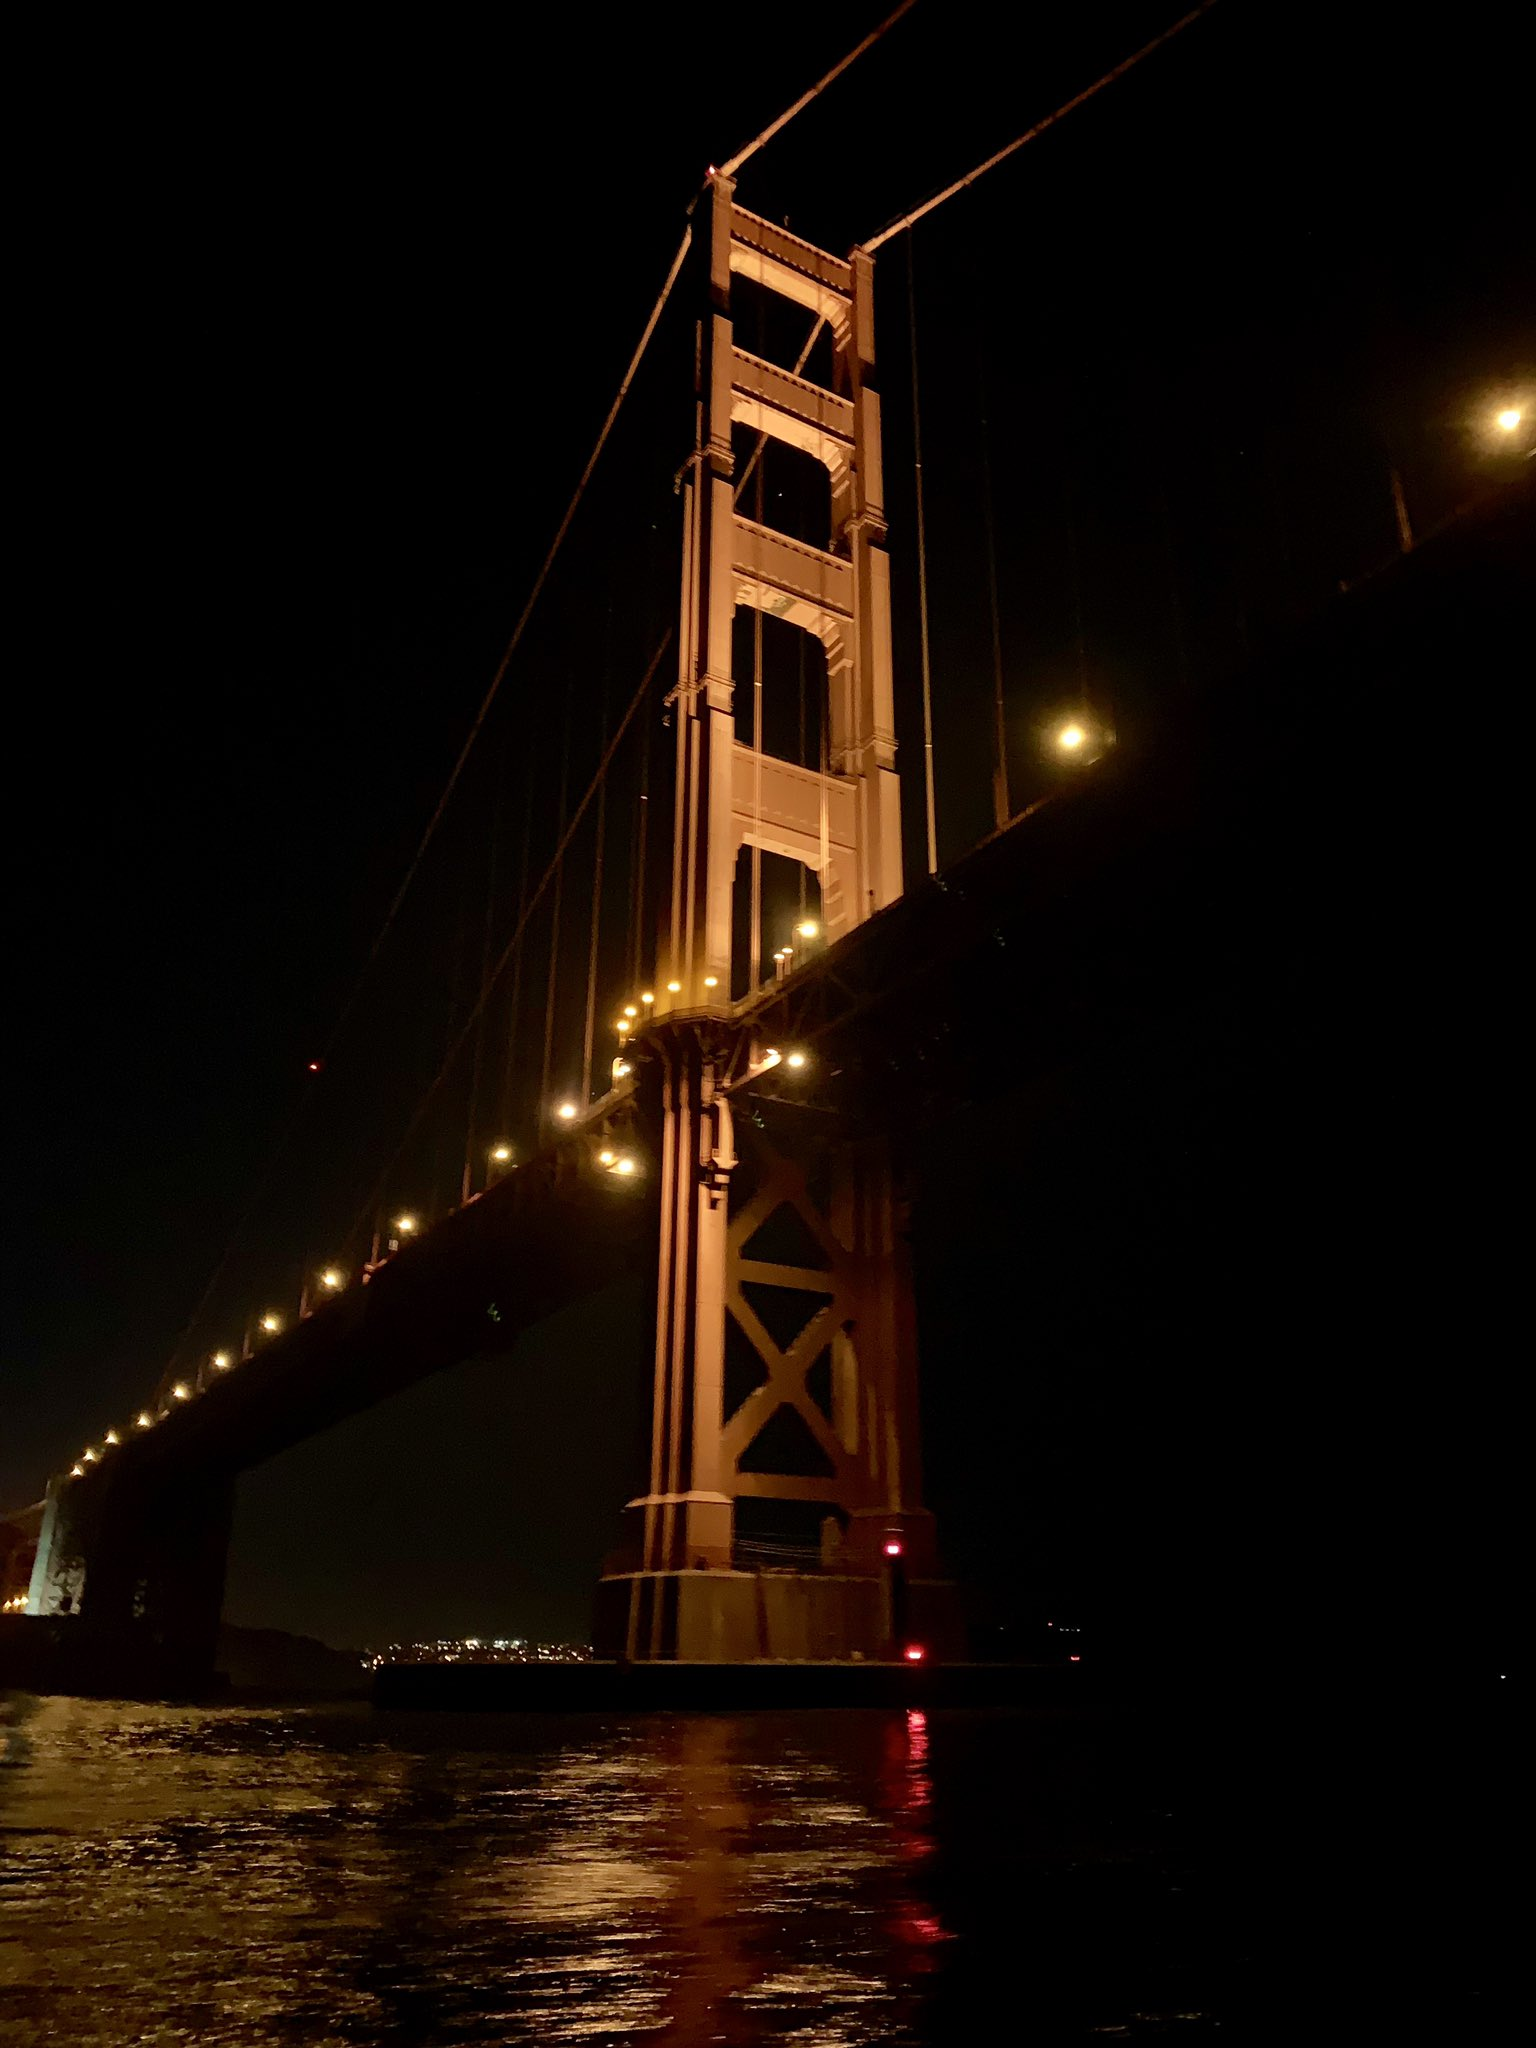 📍Golden Gate Bridge https://t.co/nG1QxSF3sp